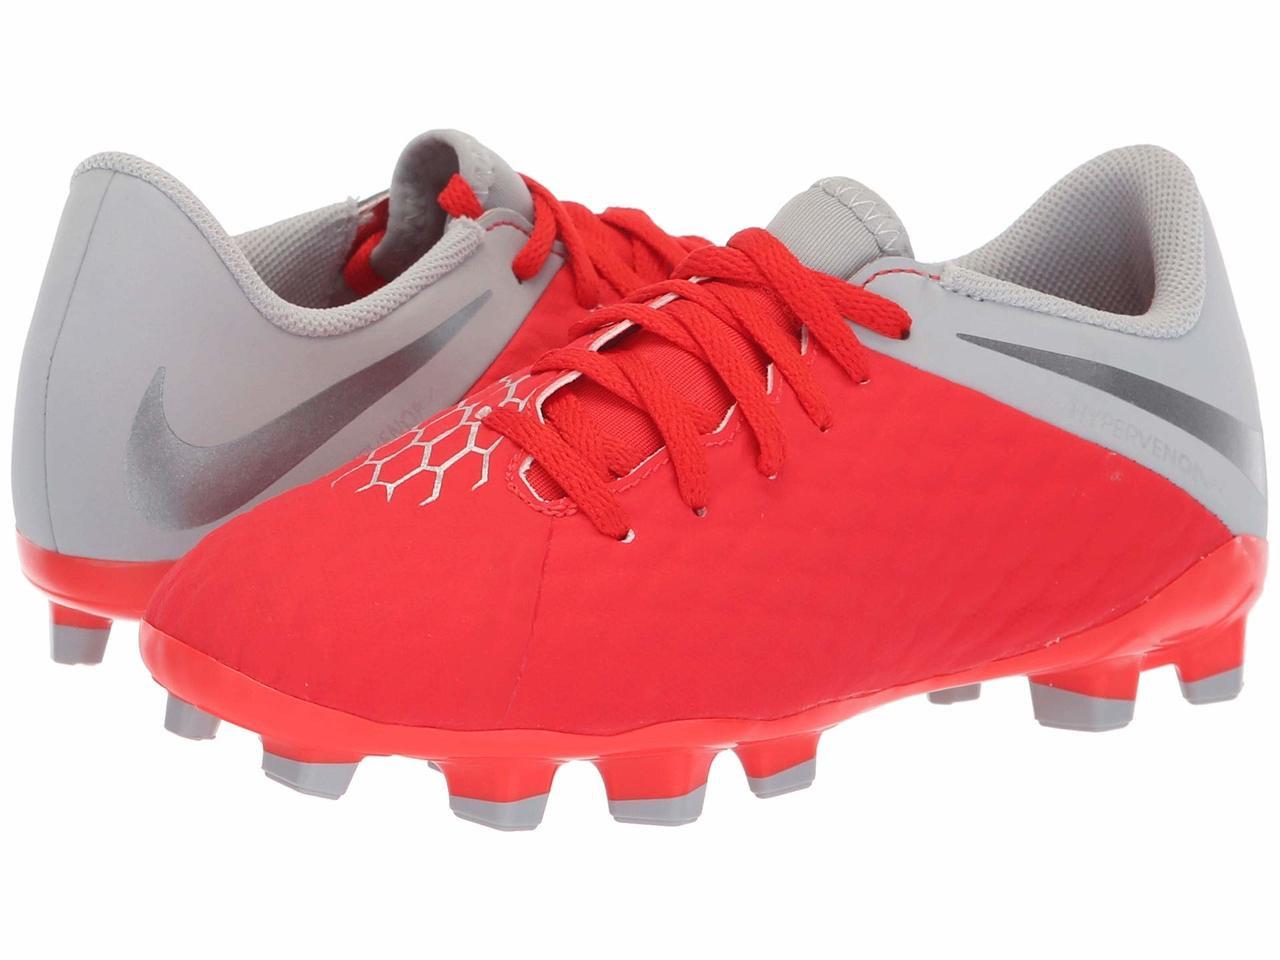 5ebec9dc273 NIKE JR HYPERVENOM 3 ACADEMY FG Crimson - Soccer Plus